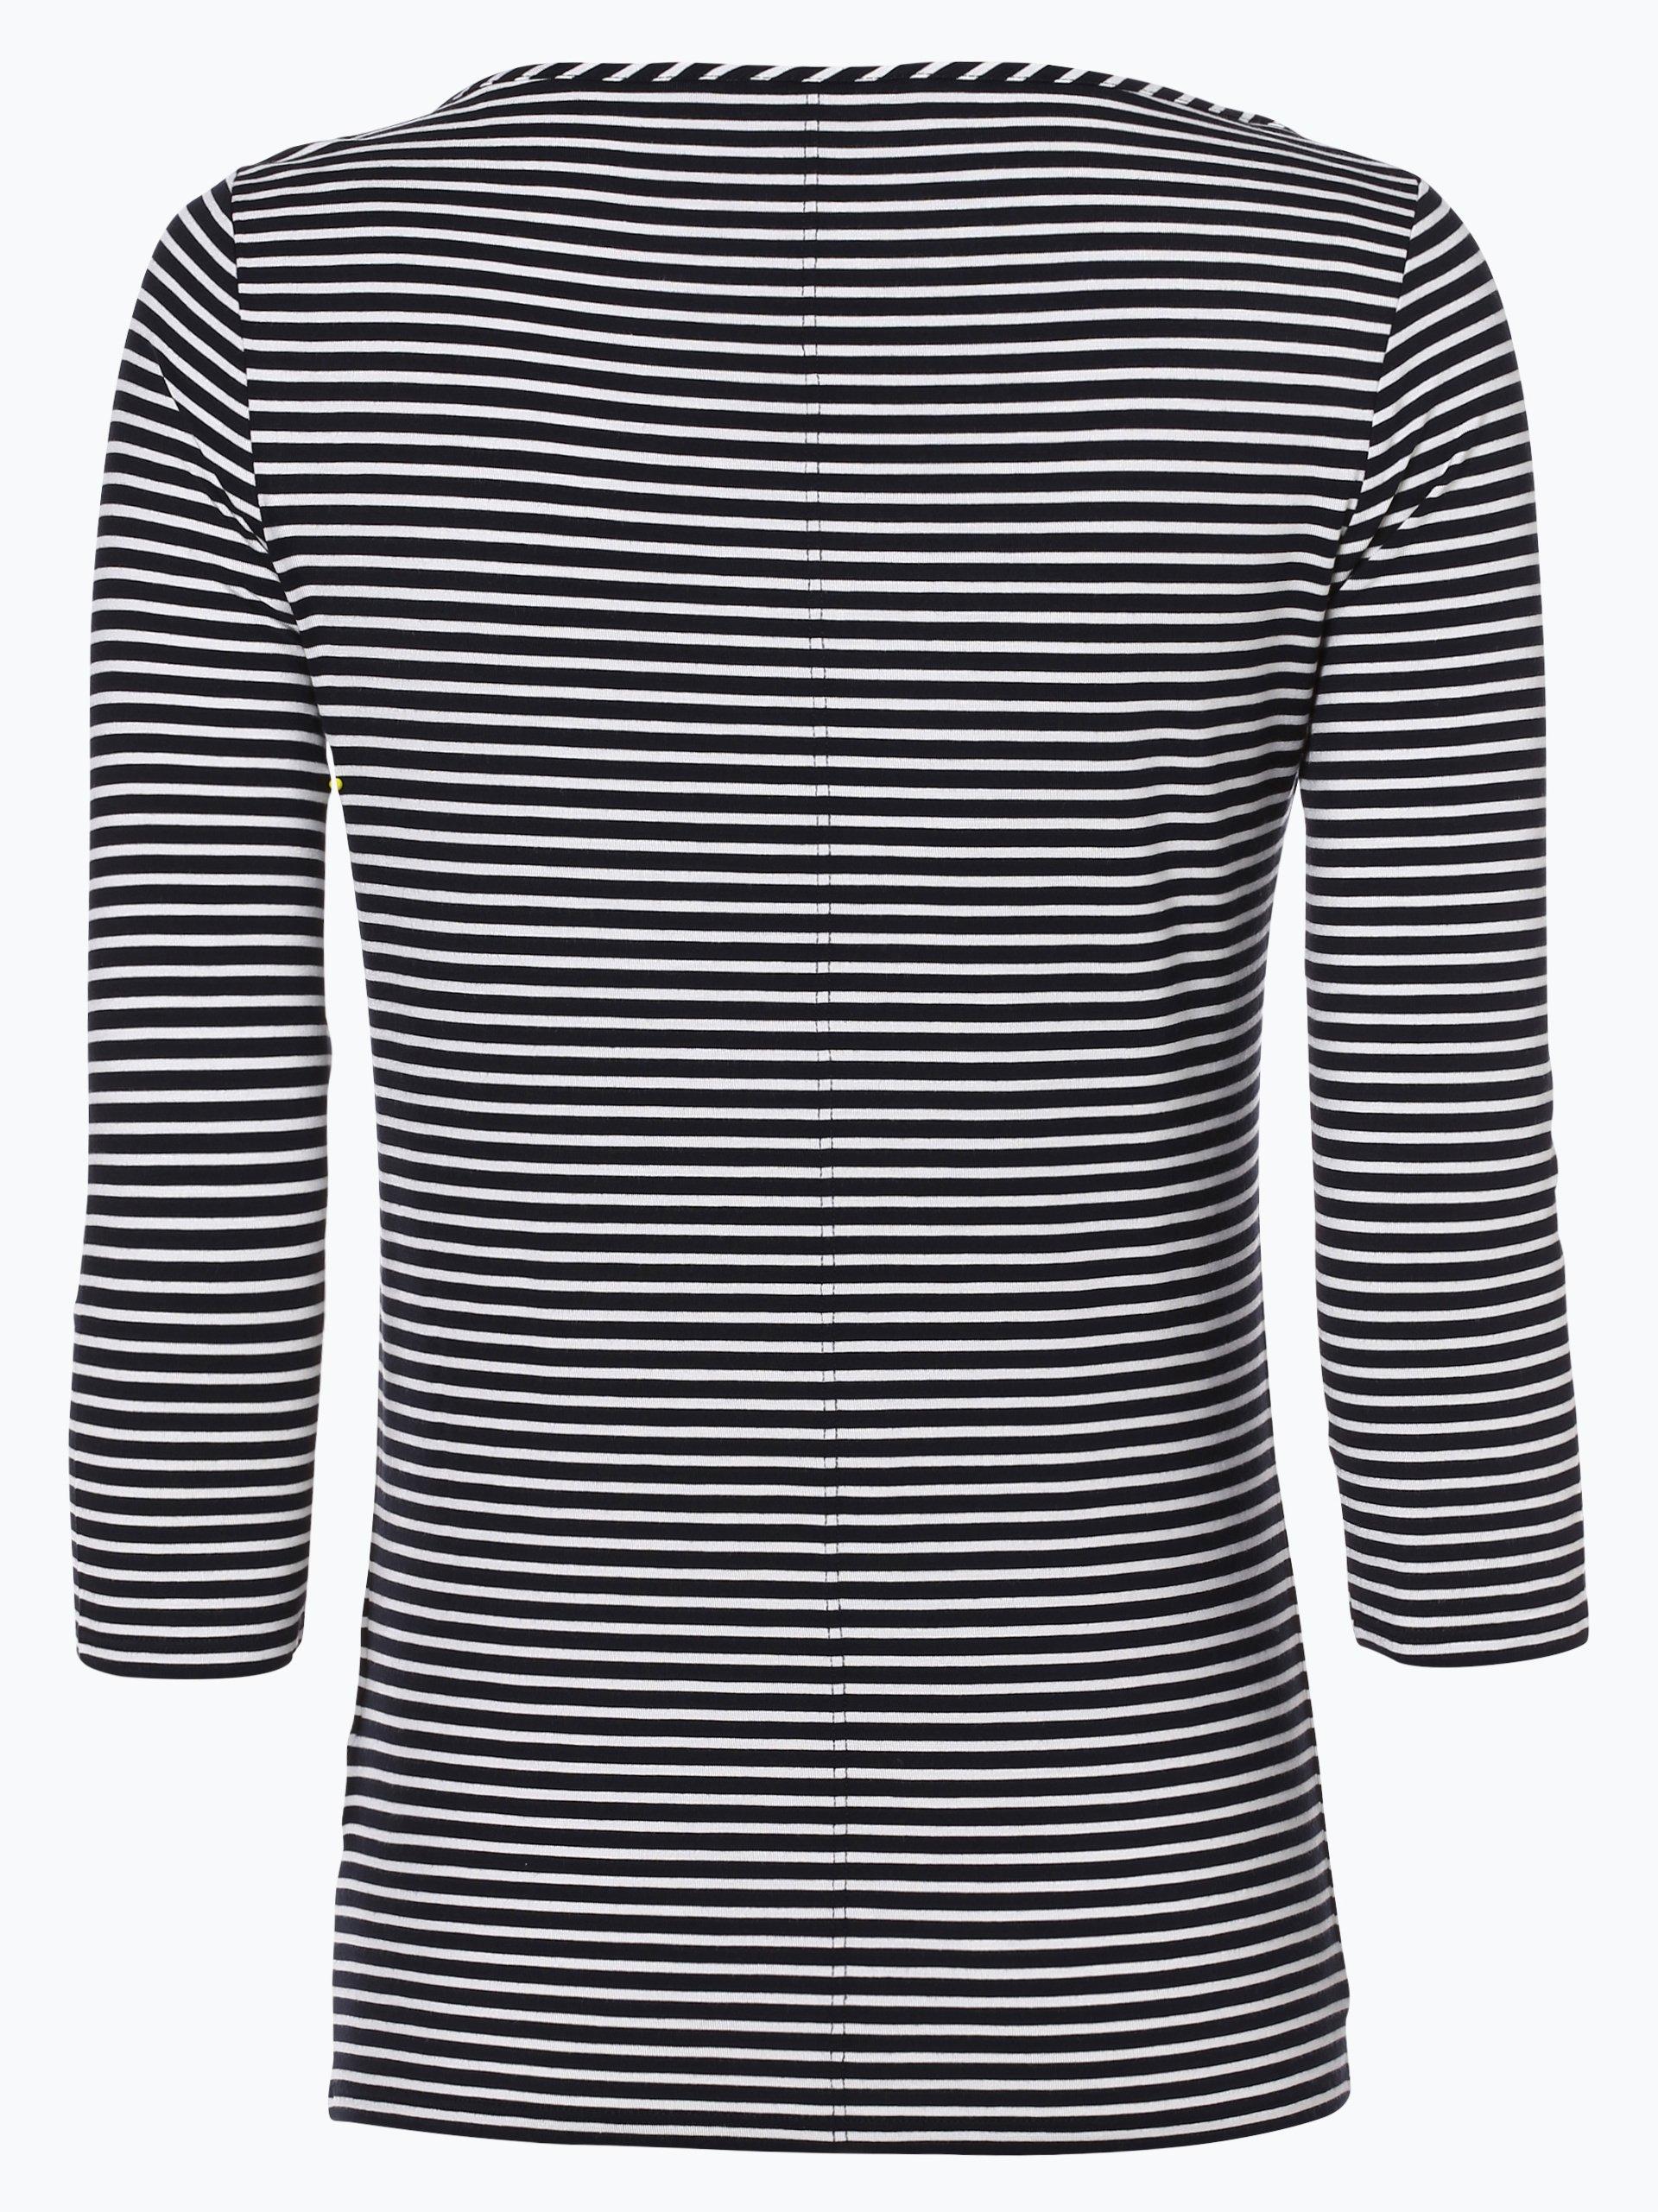 Tommy Hilfiger Damen Shirt - New Jada